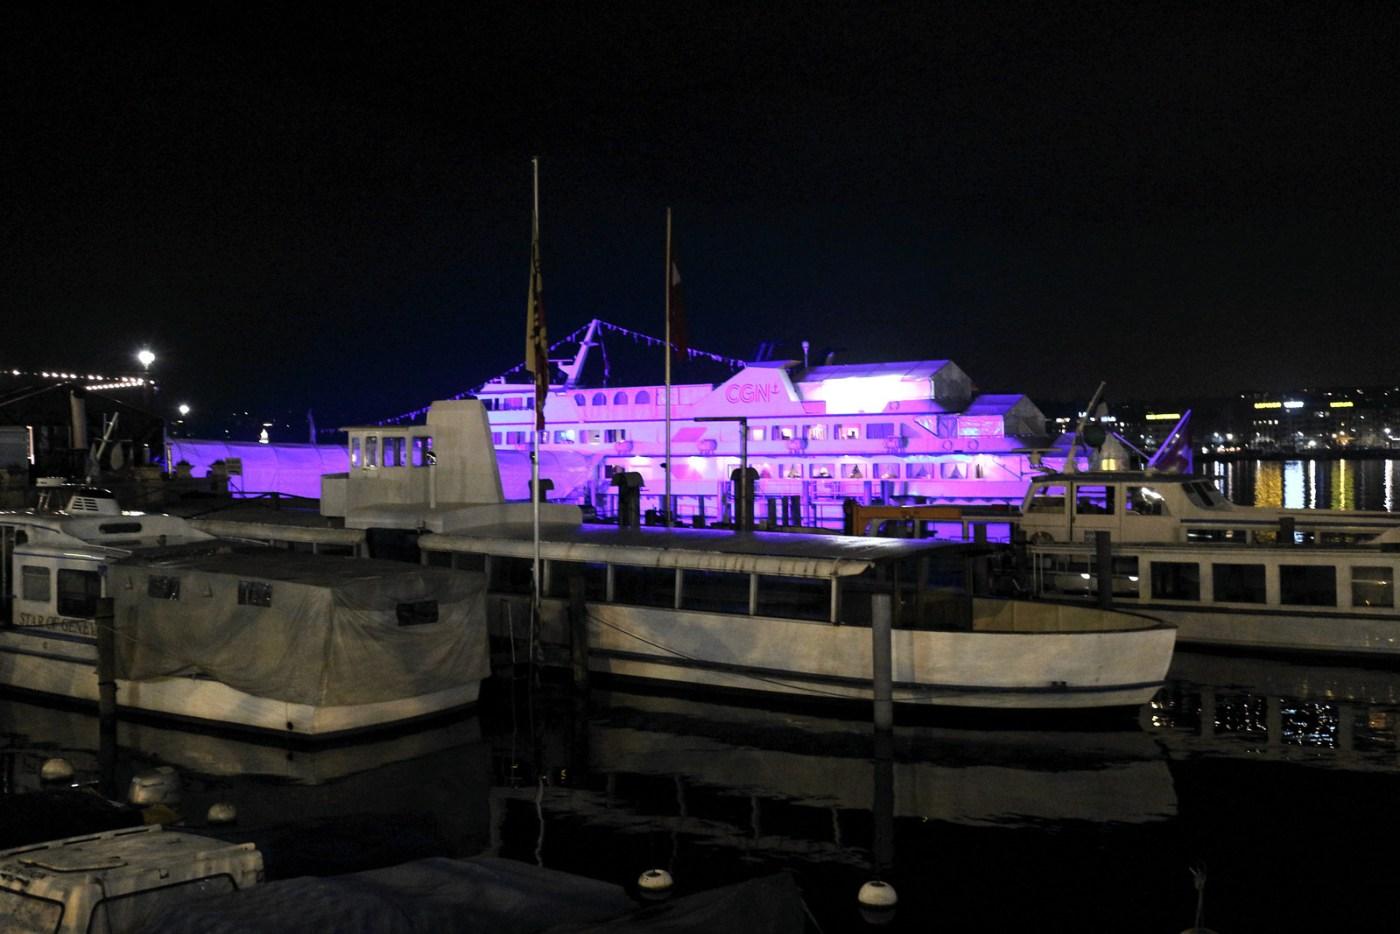 The Boat at SIHH 2014